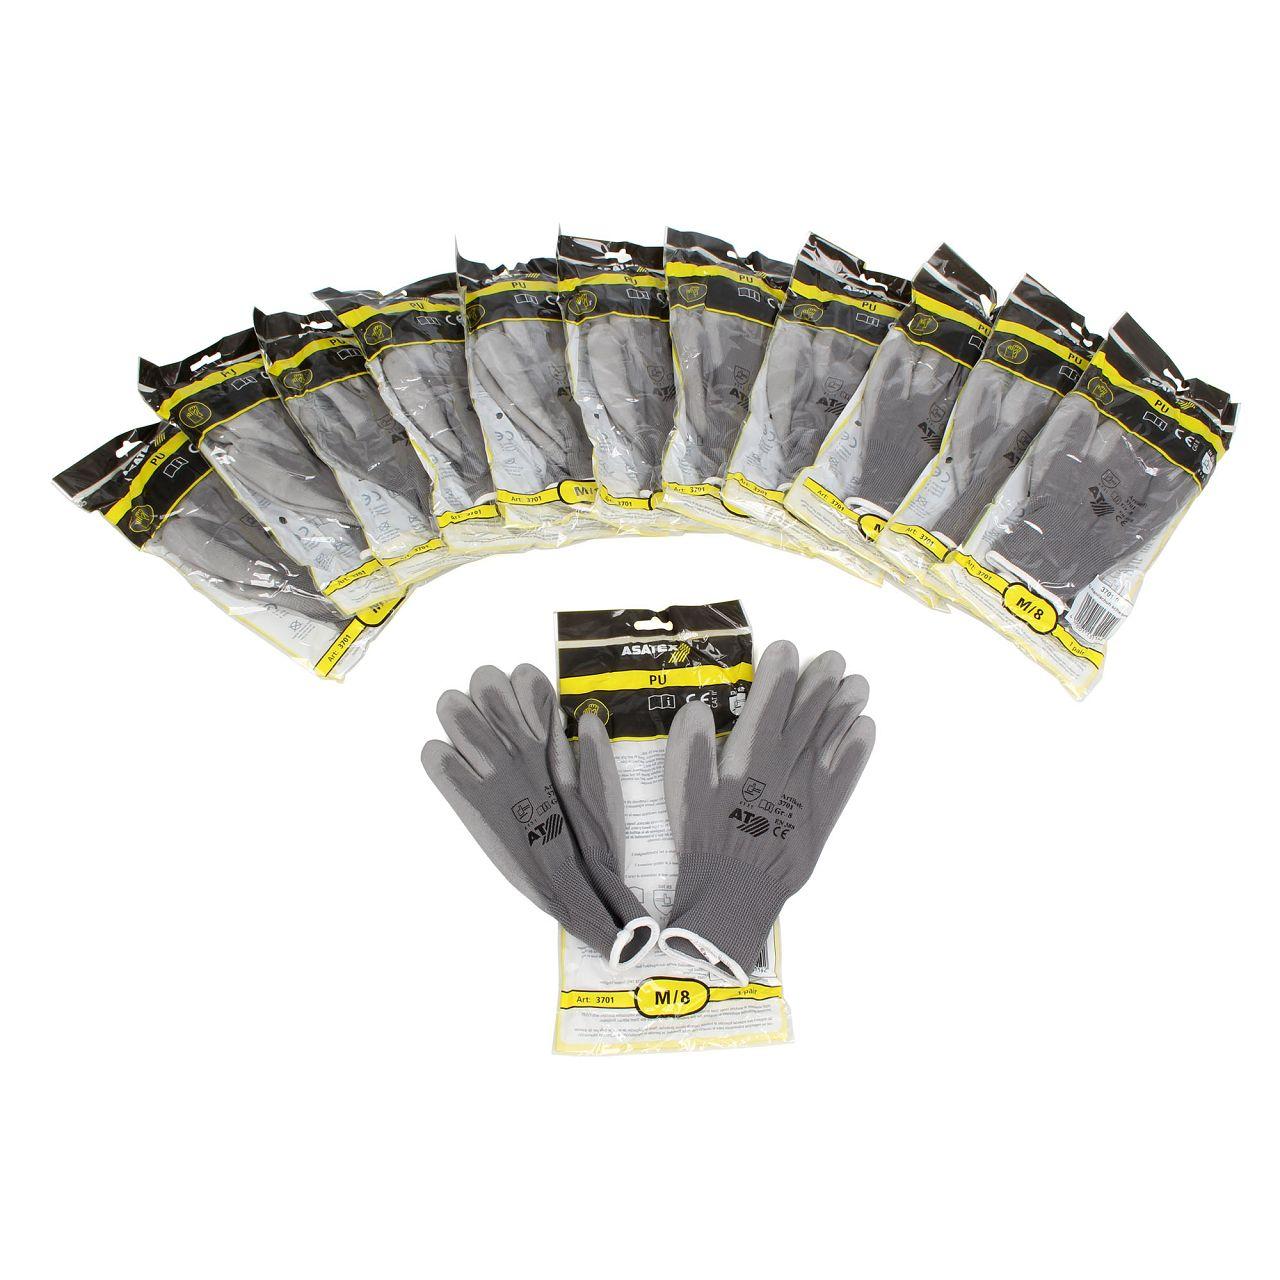 ASATEX 3701 Handschuhe Arbeitshandschuhe GUMMIERT - GRAU Größe 8 / M (12 Paar)